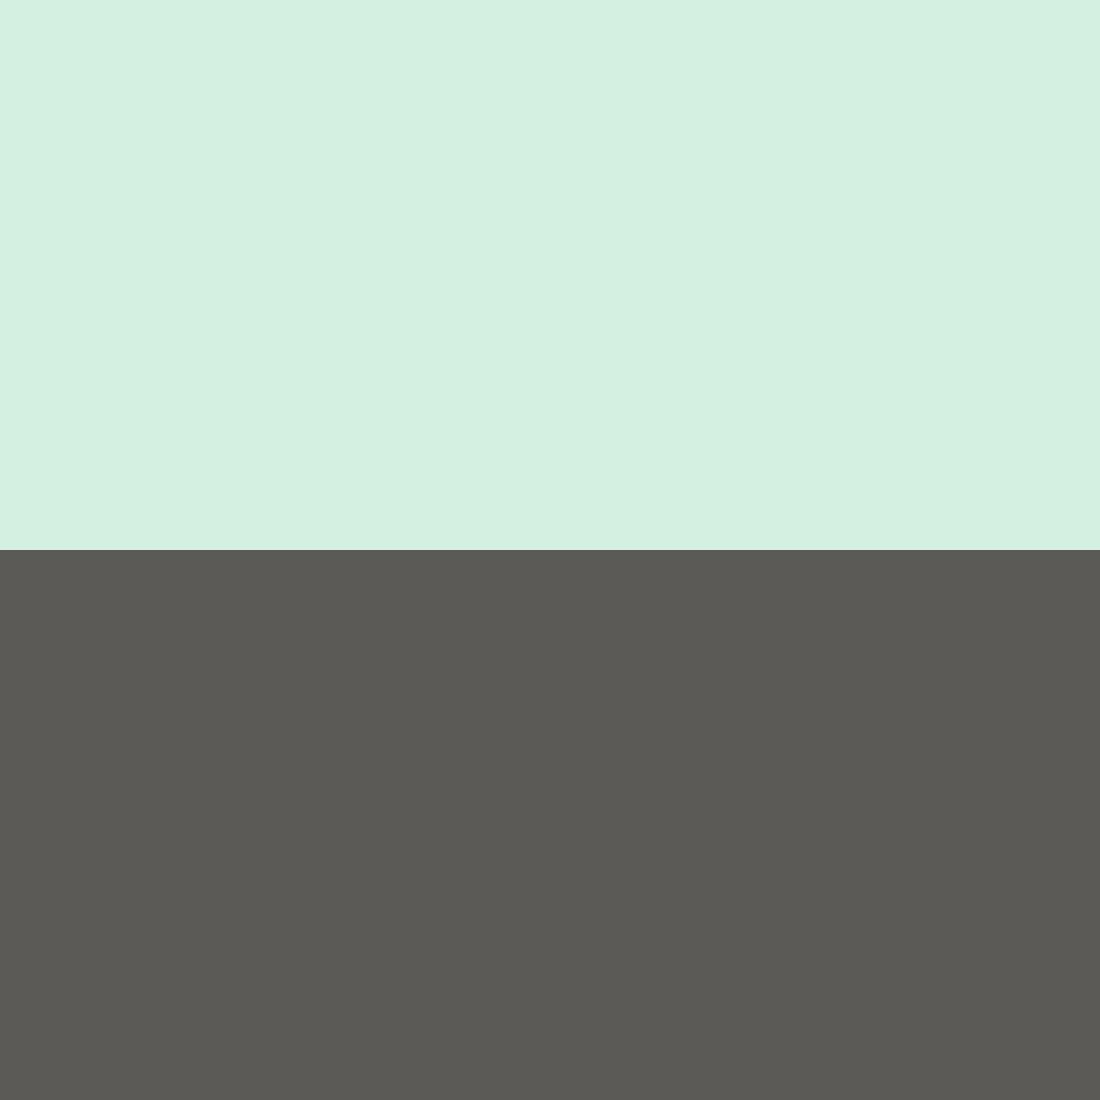 Splash Mint/Anthracite 4 x 3100 x 1550mm